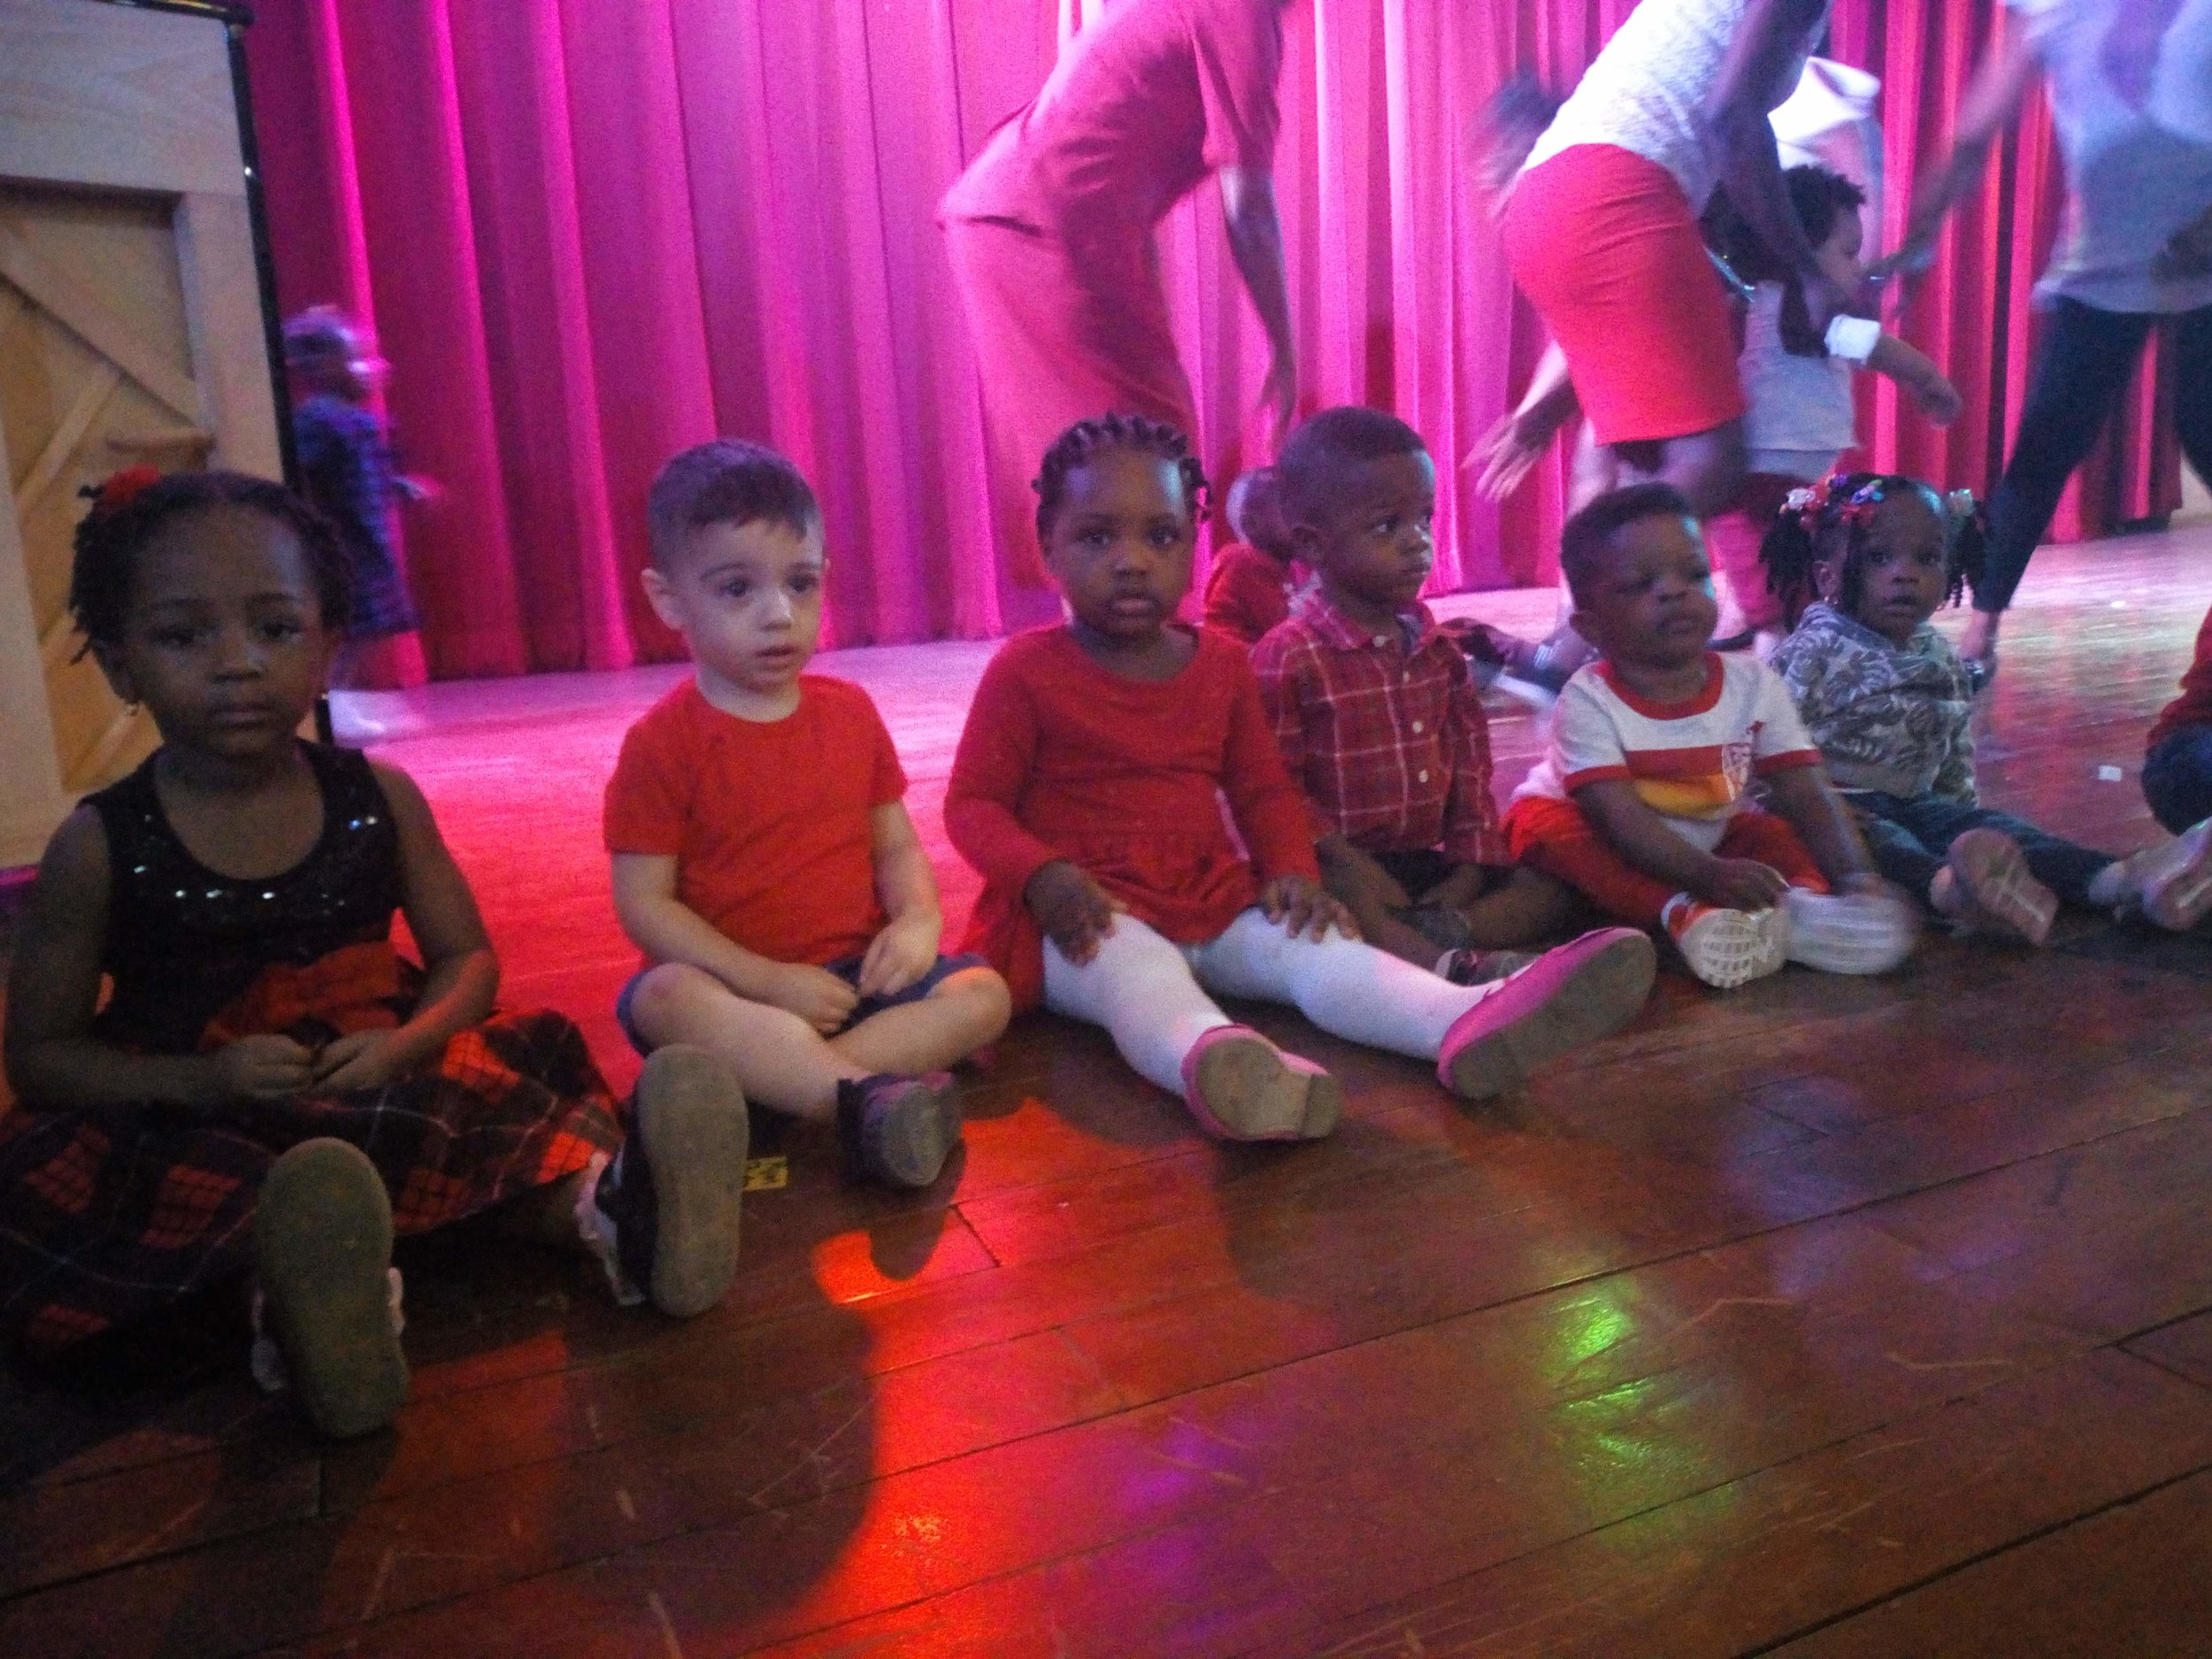 Preschool Valentine's Day celebration!